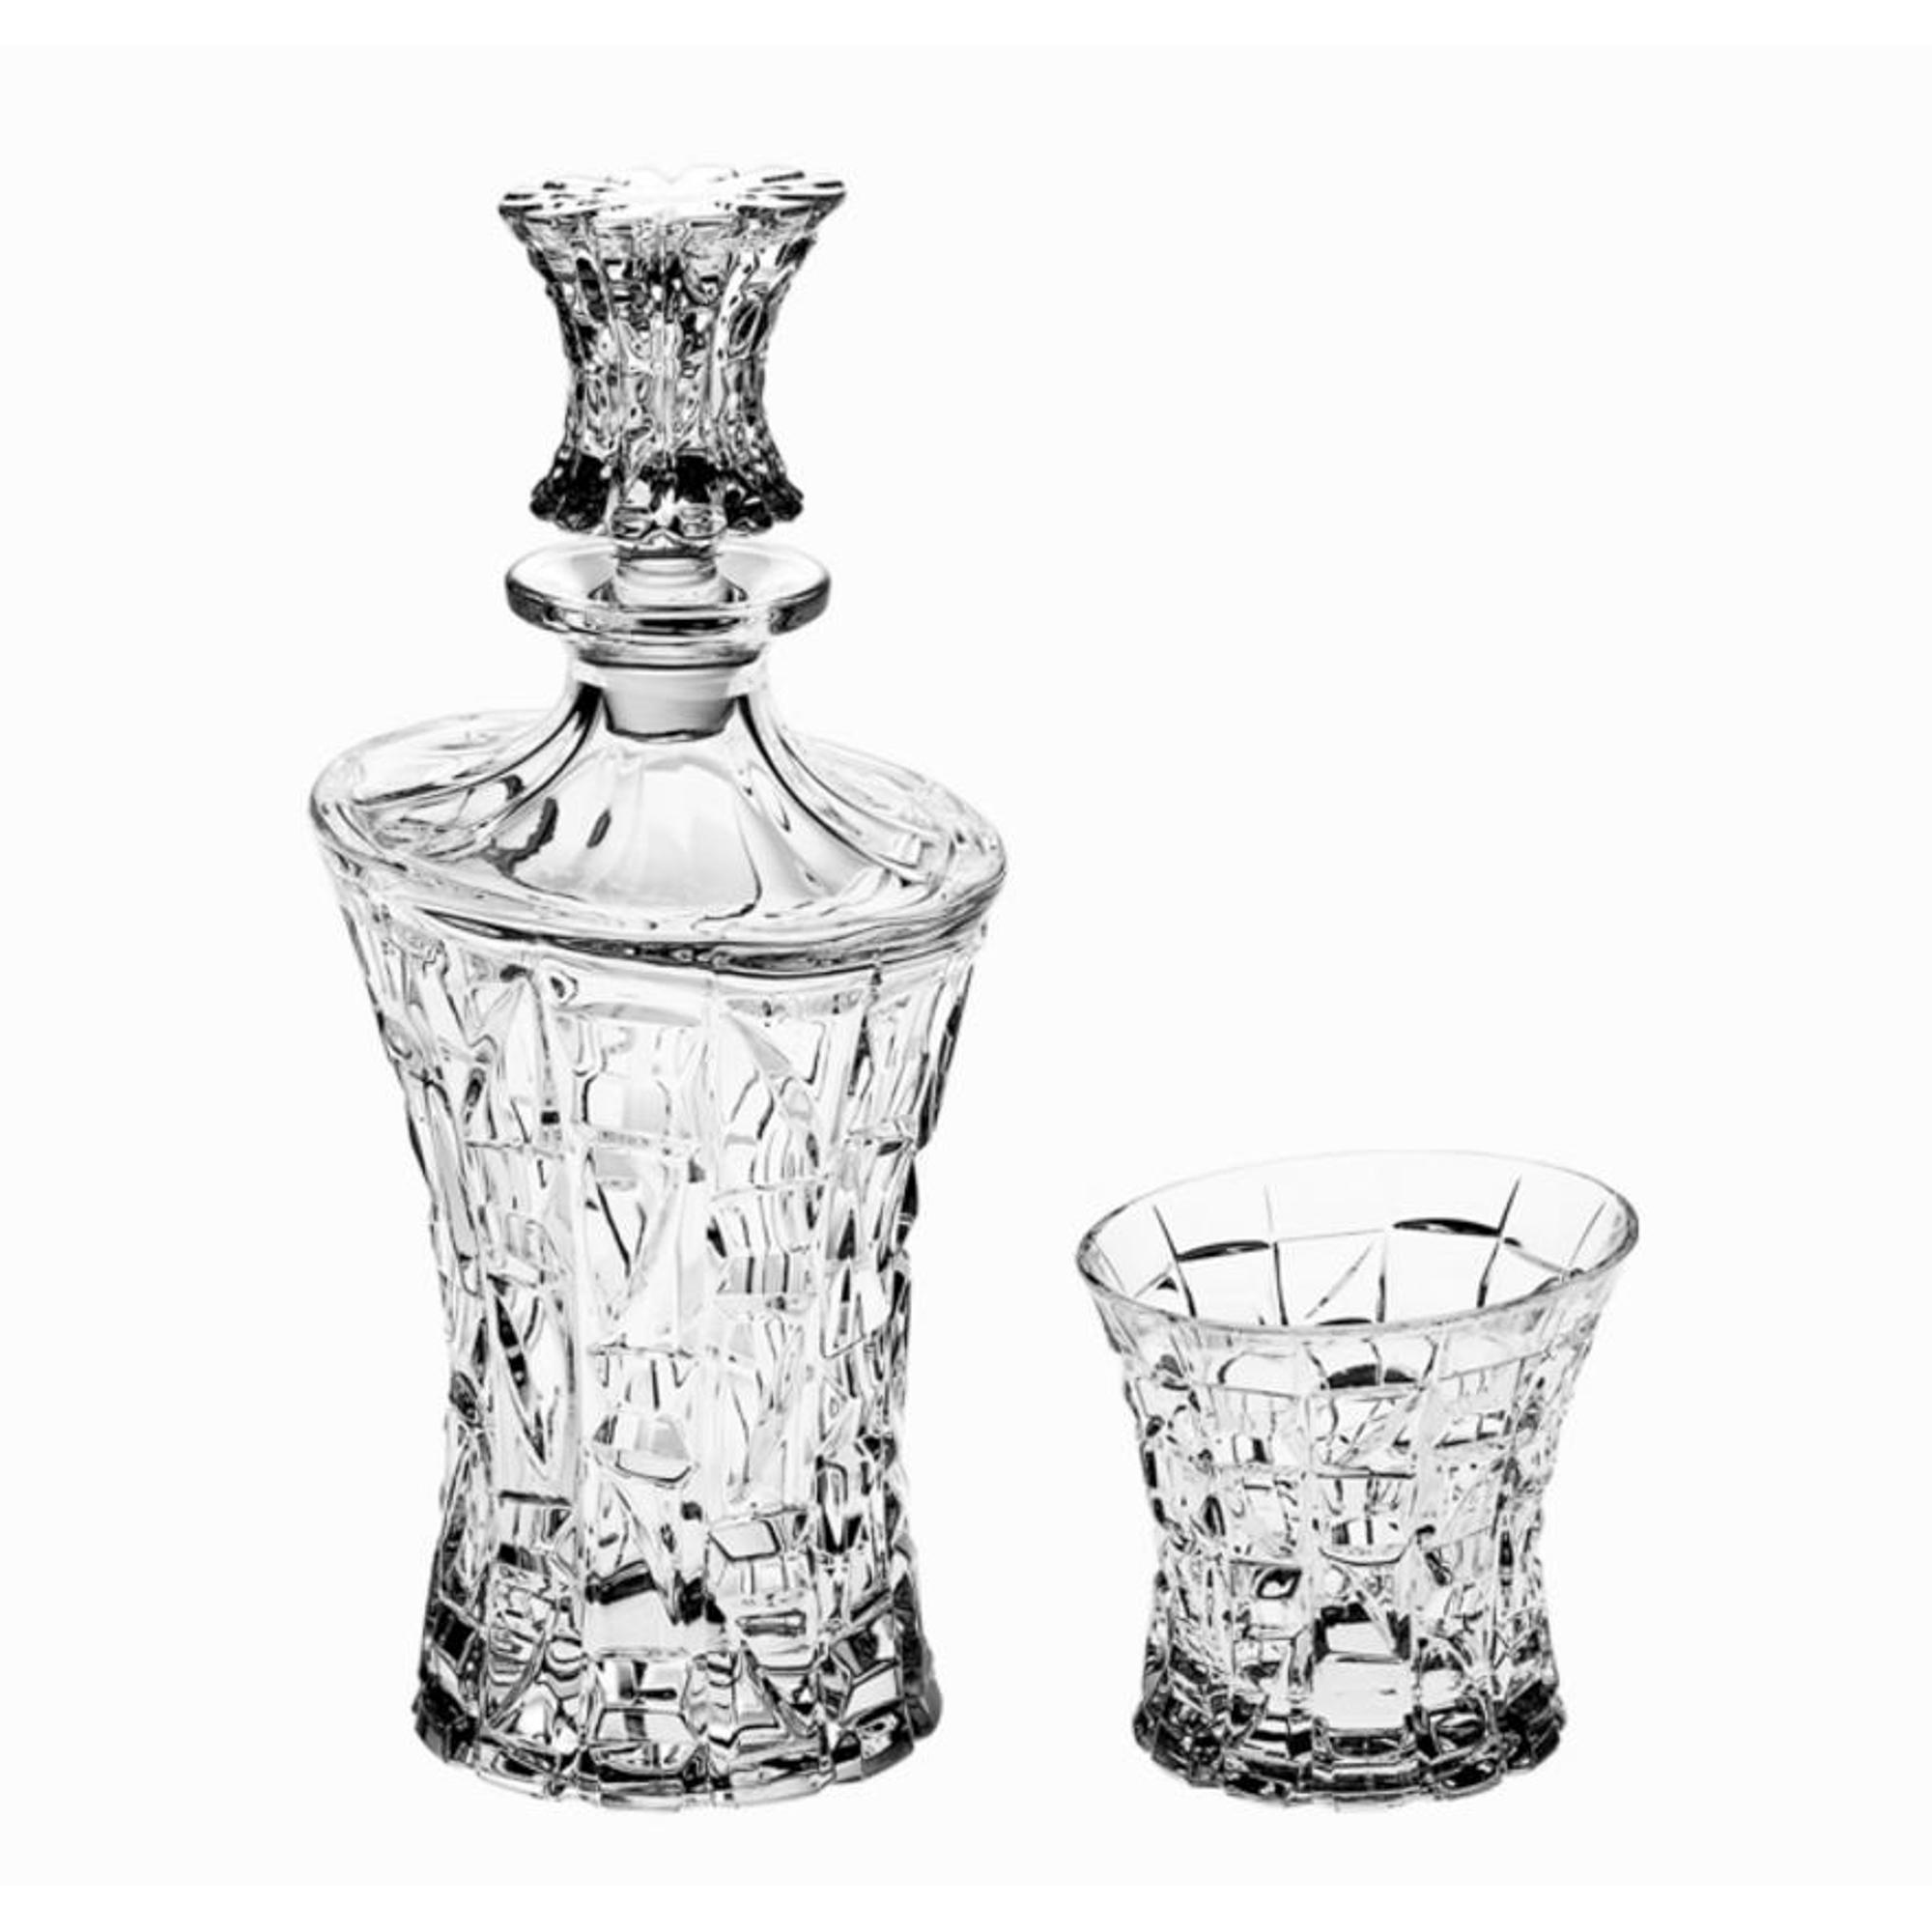 Набор для виски штоф Crystal bohemia a.s. 990/99999/9/47610/830-309 набор для виски 7 шт samurai crystal bohemia 990 99999 9 22615 789 709